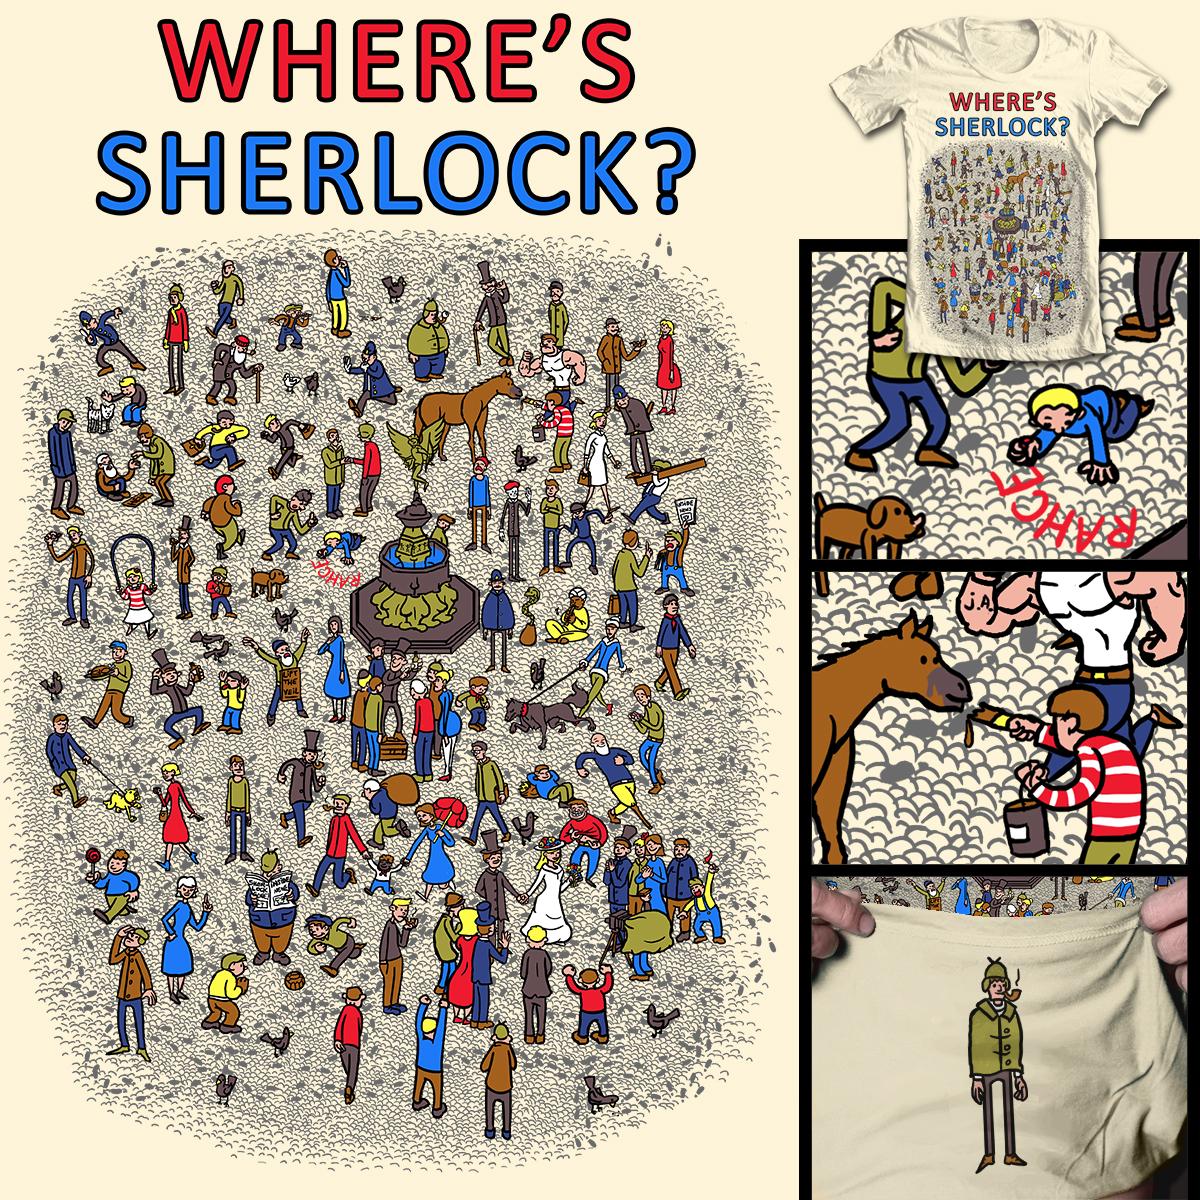 Where's Sherlock? by Mantichore on Threadless